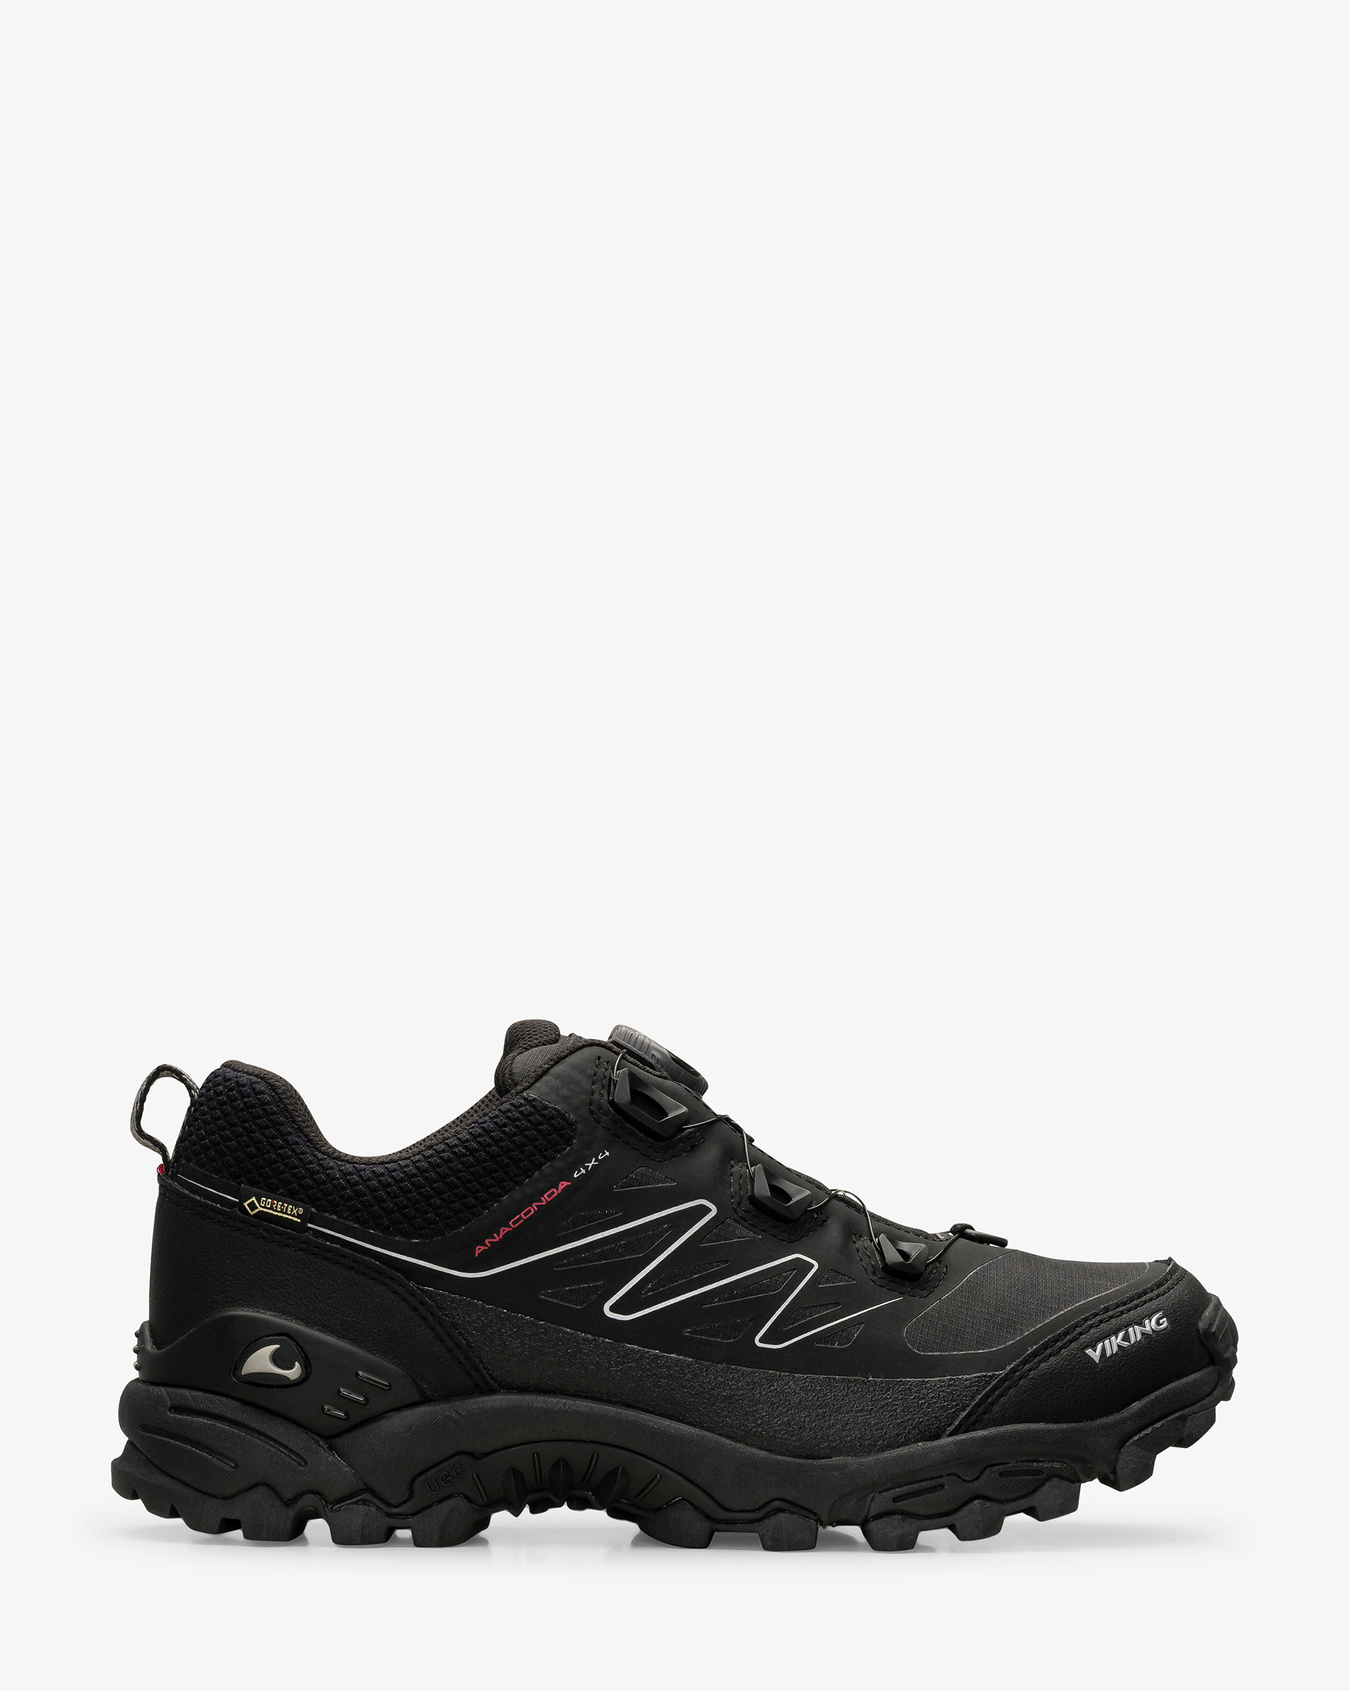 Anaconda 4x4 Boa GTX Hiking Shoe